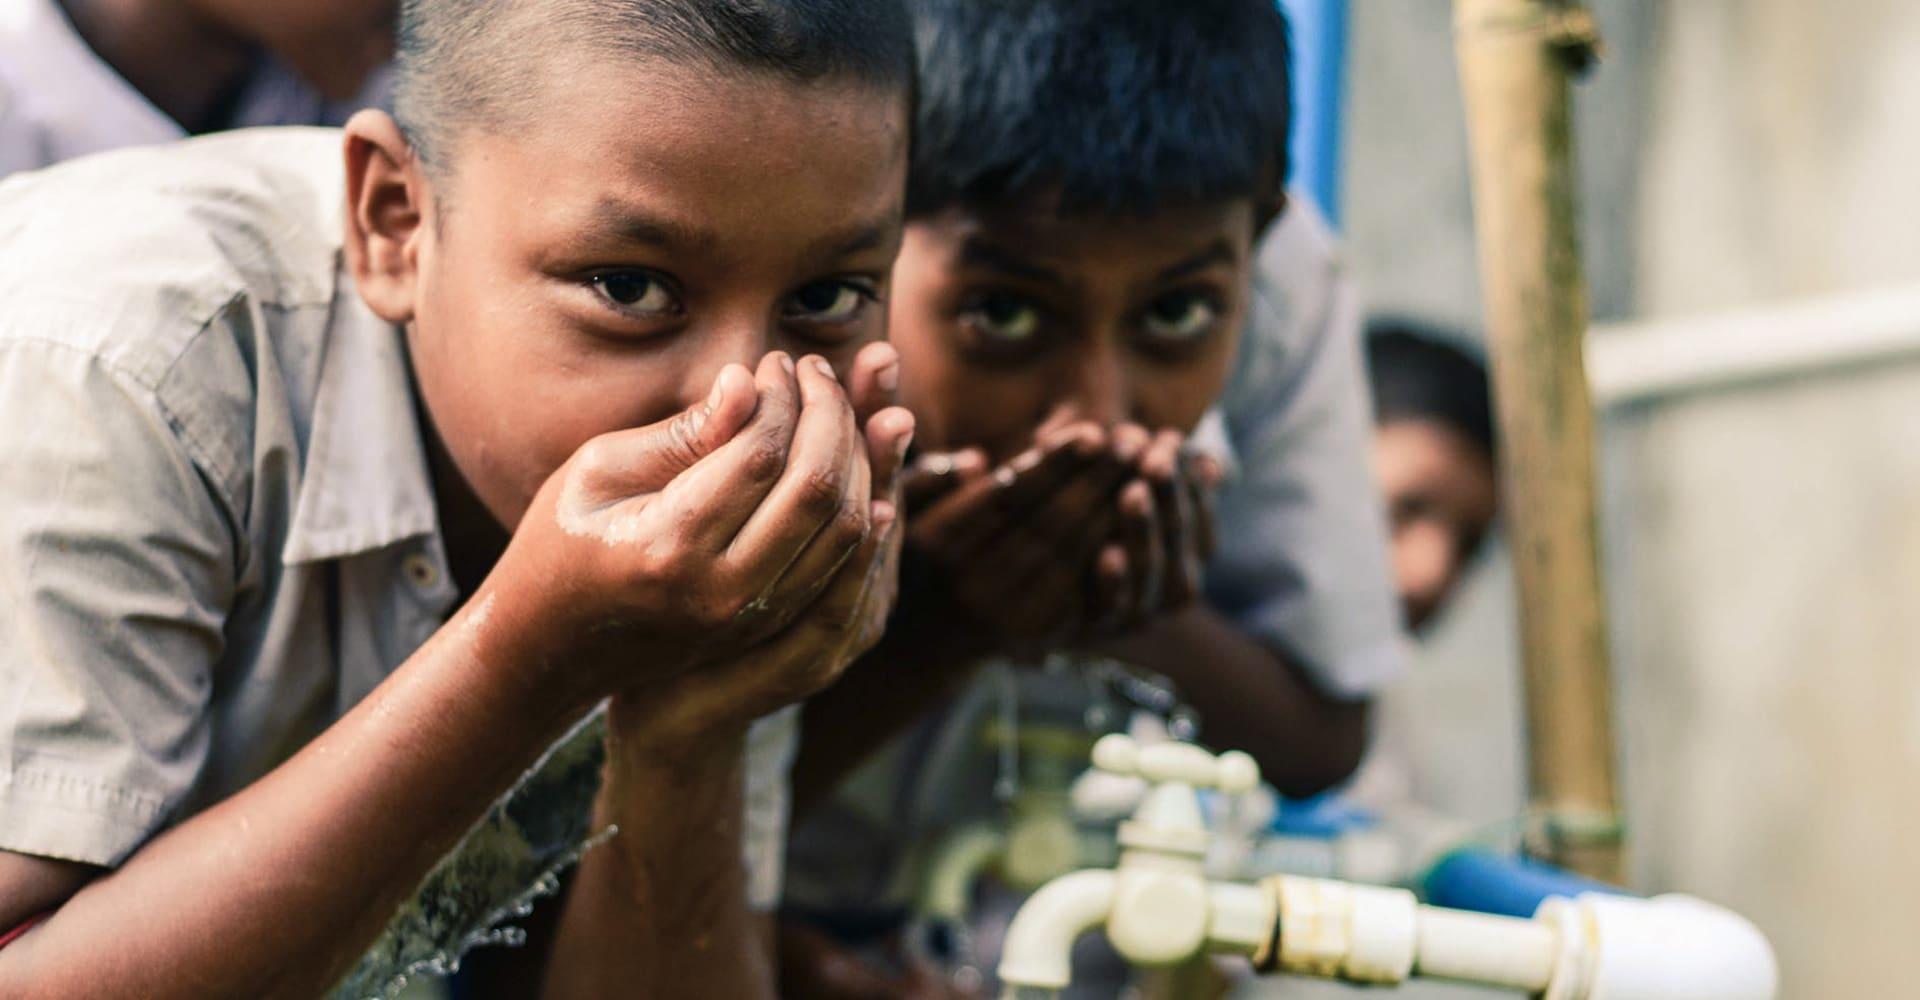 Niños beben agua limpia